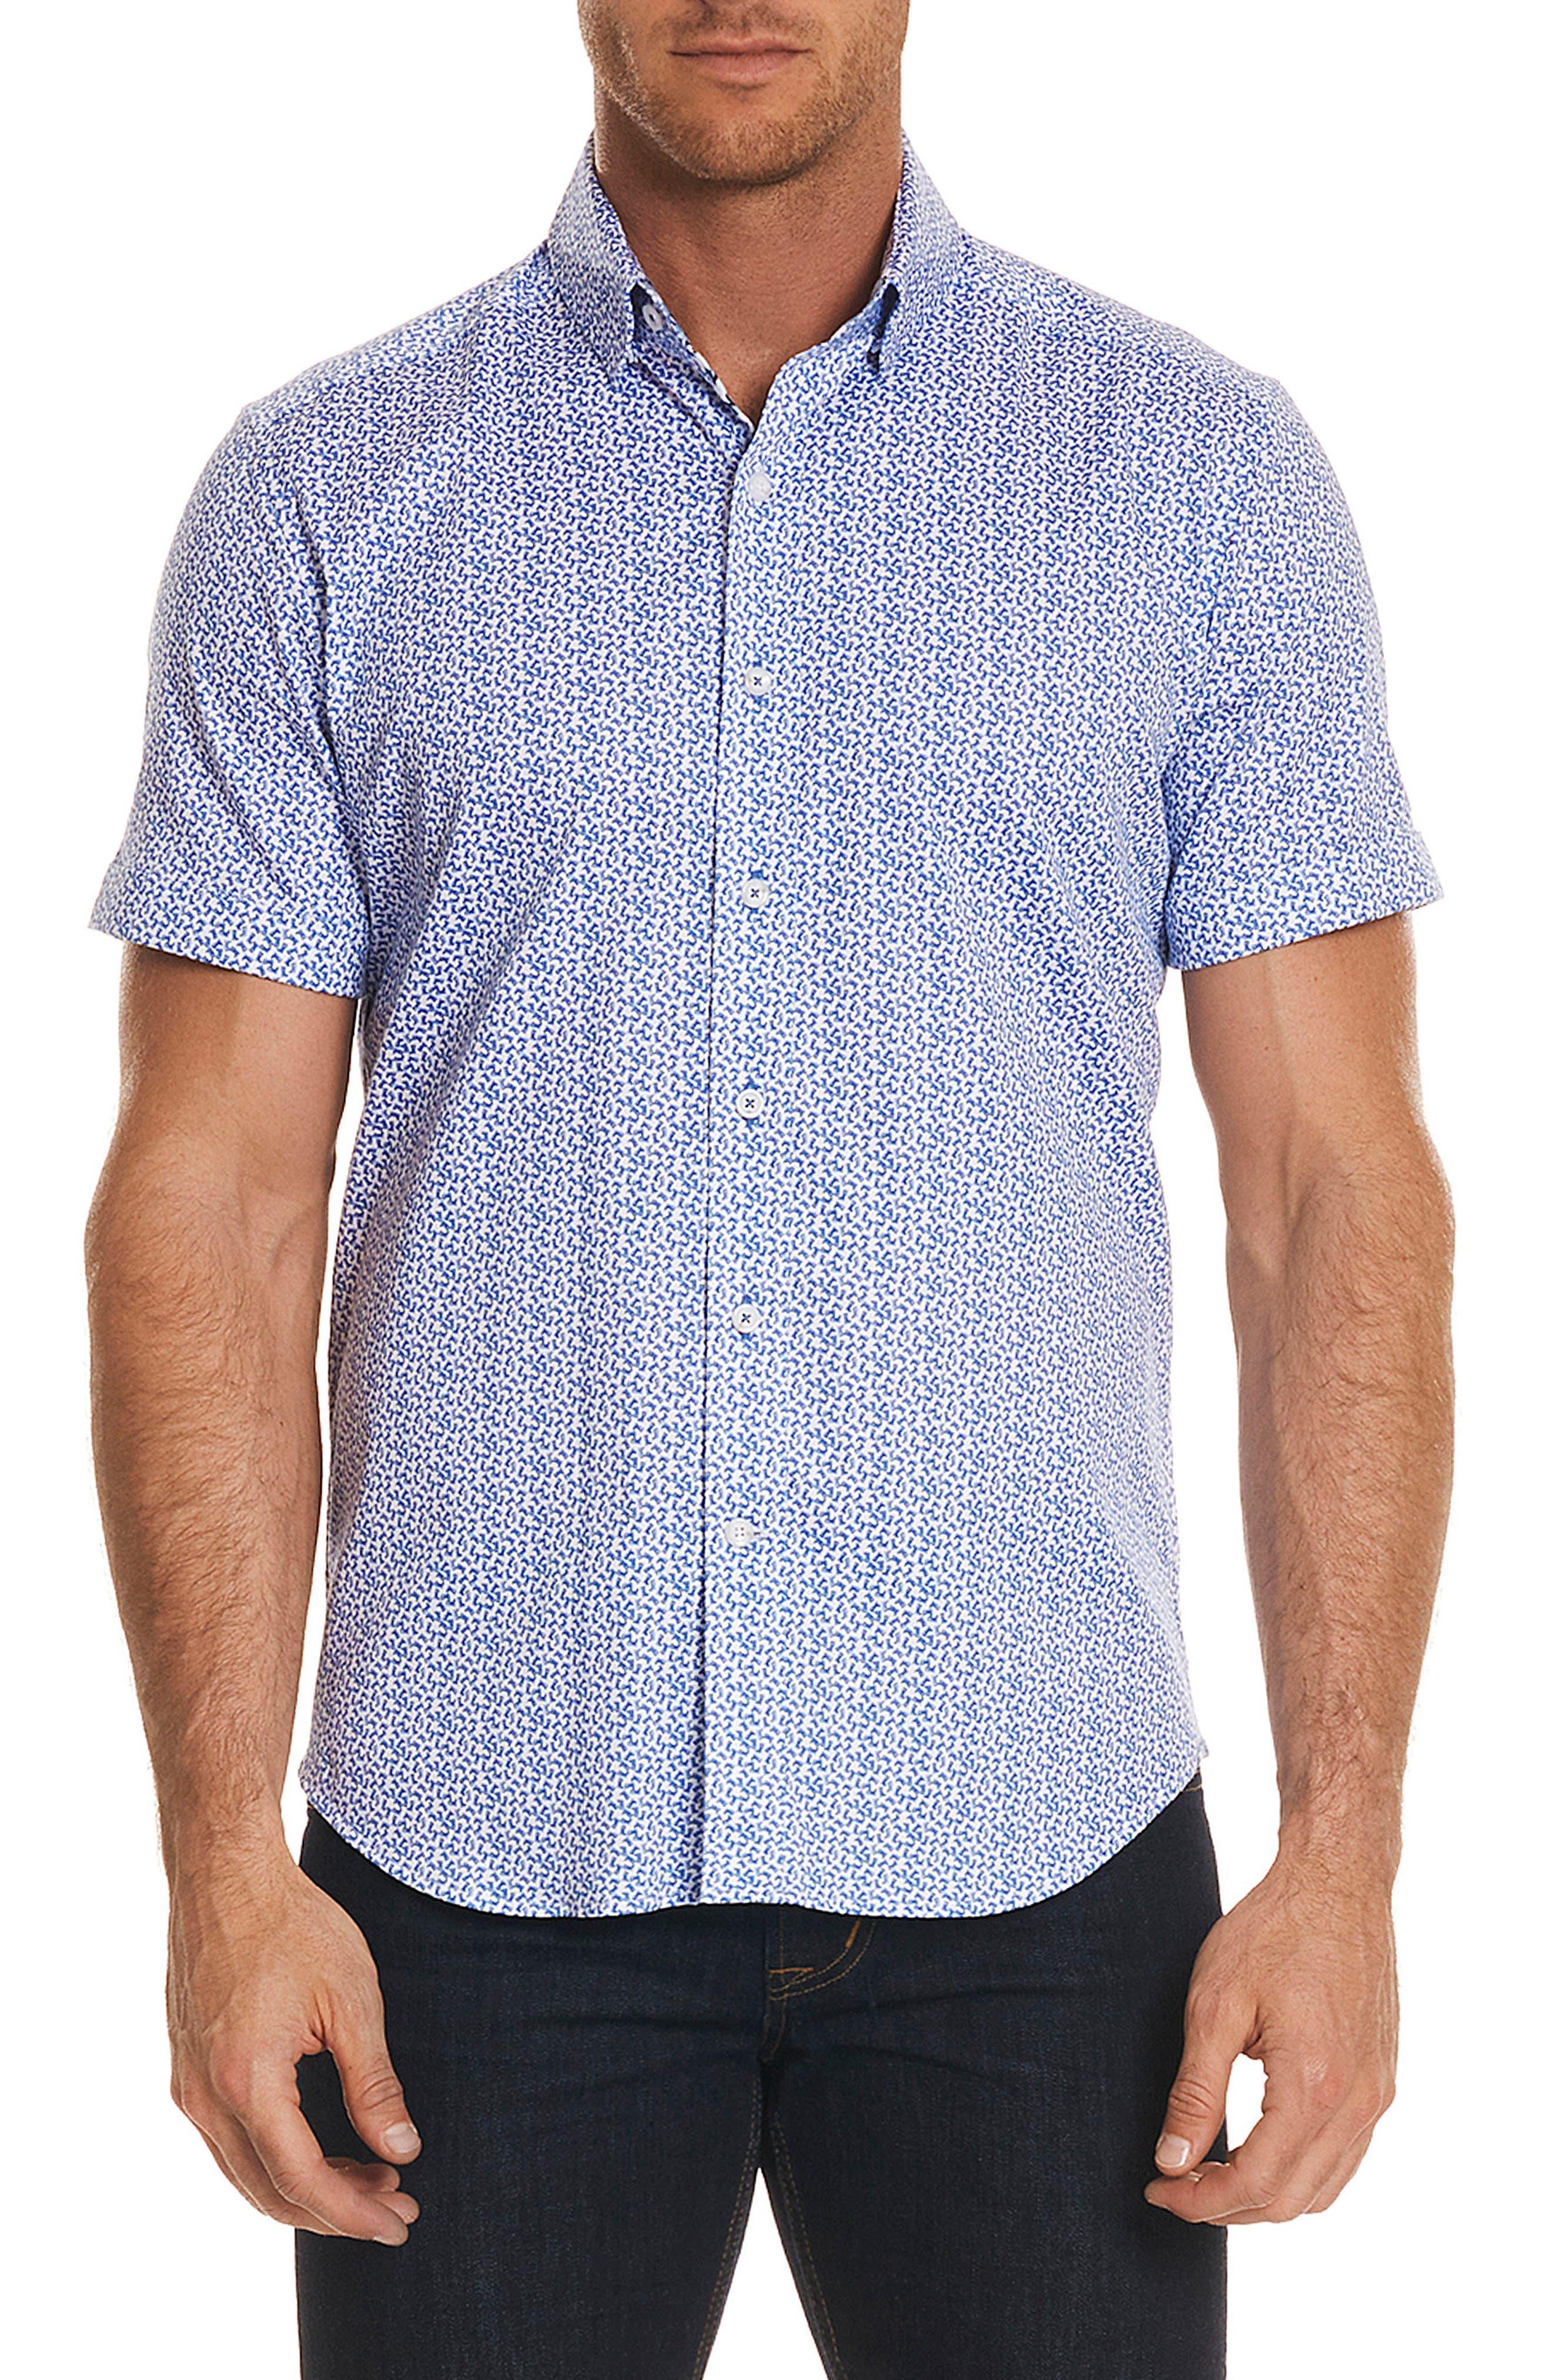 Hartman Tailored Fit Sport Shirt,                         Main,                         color,